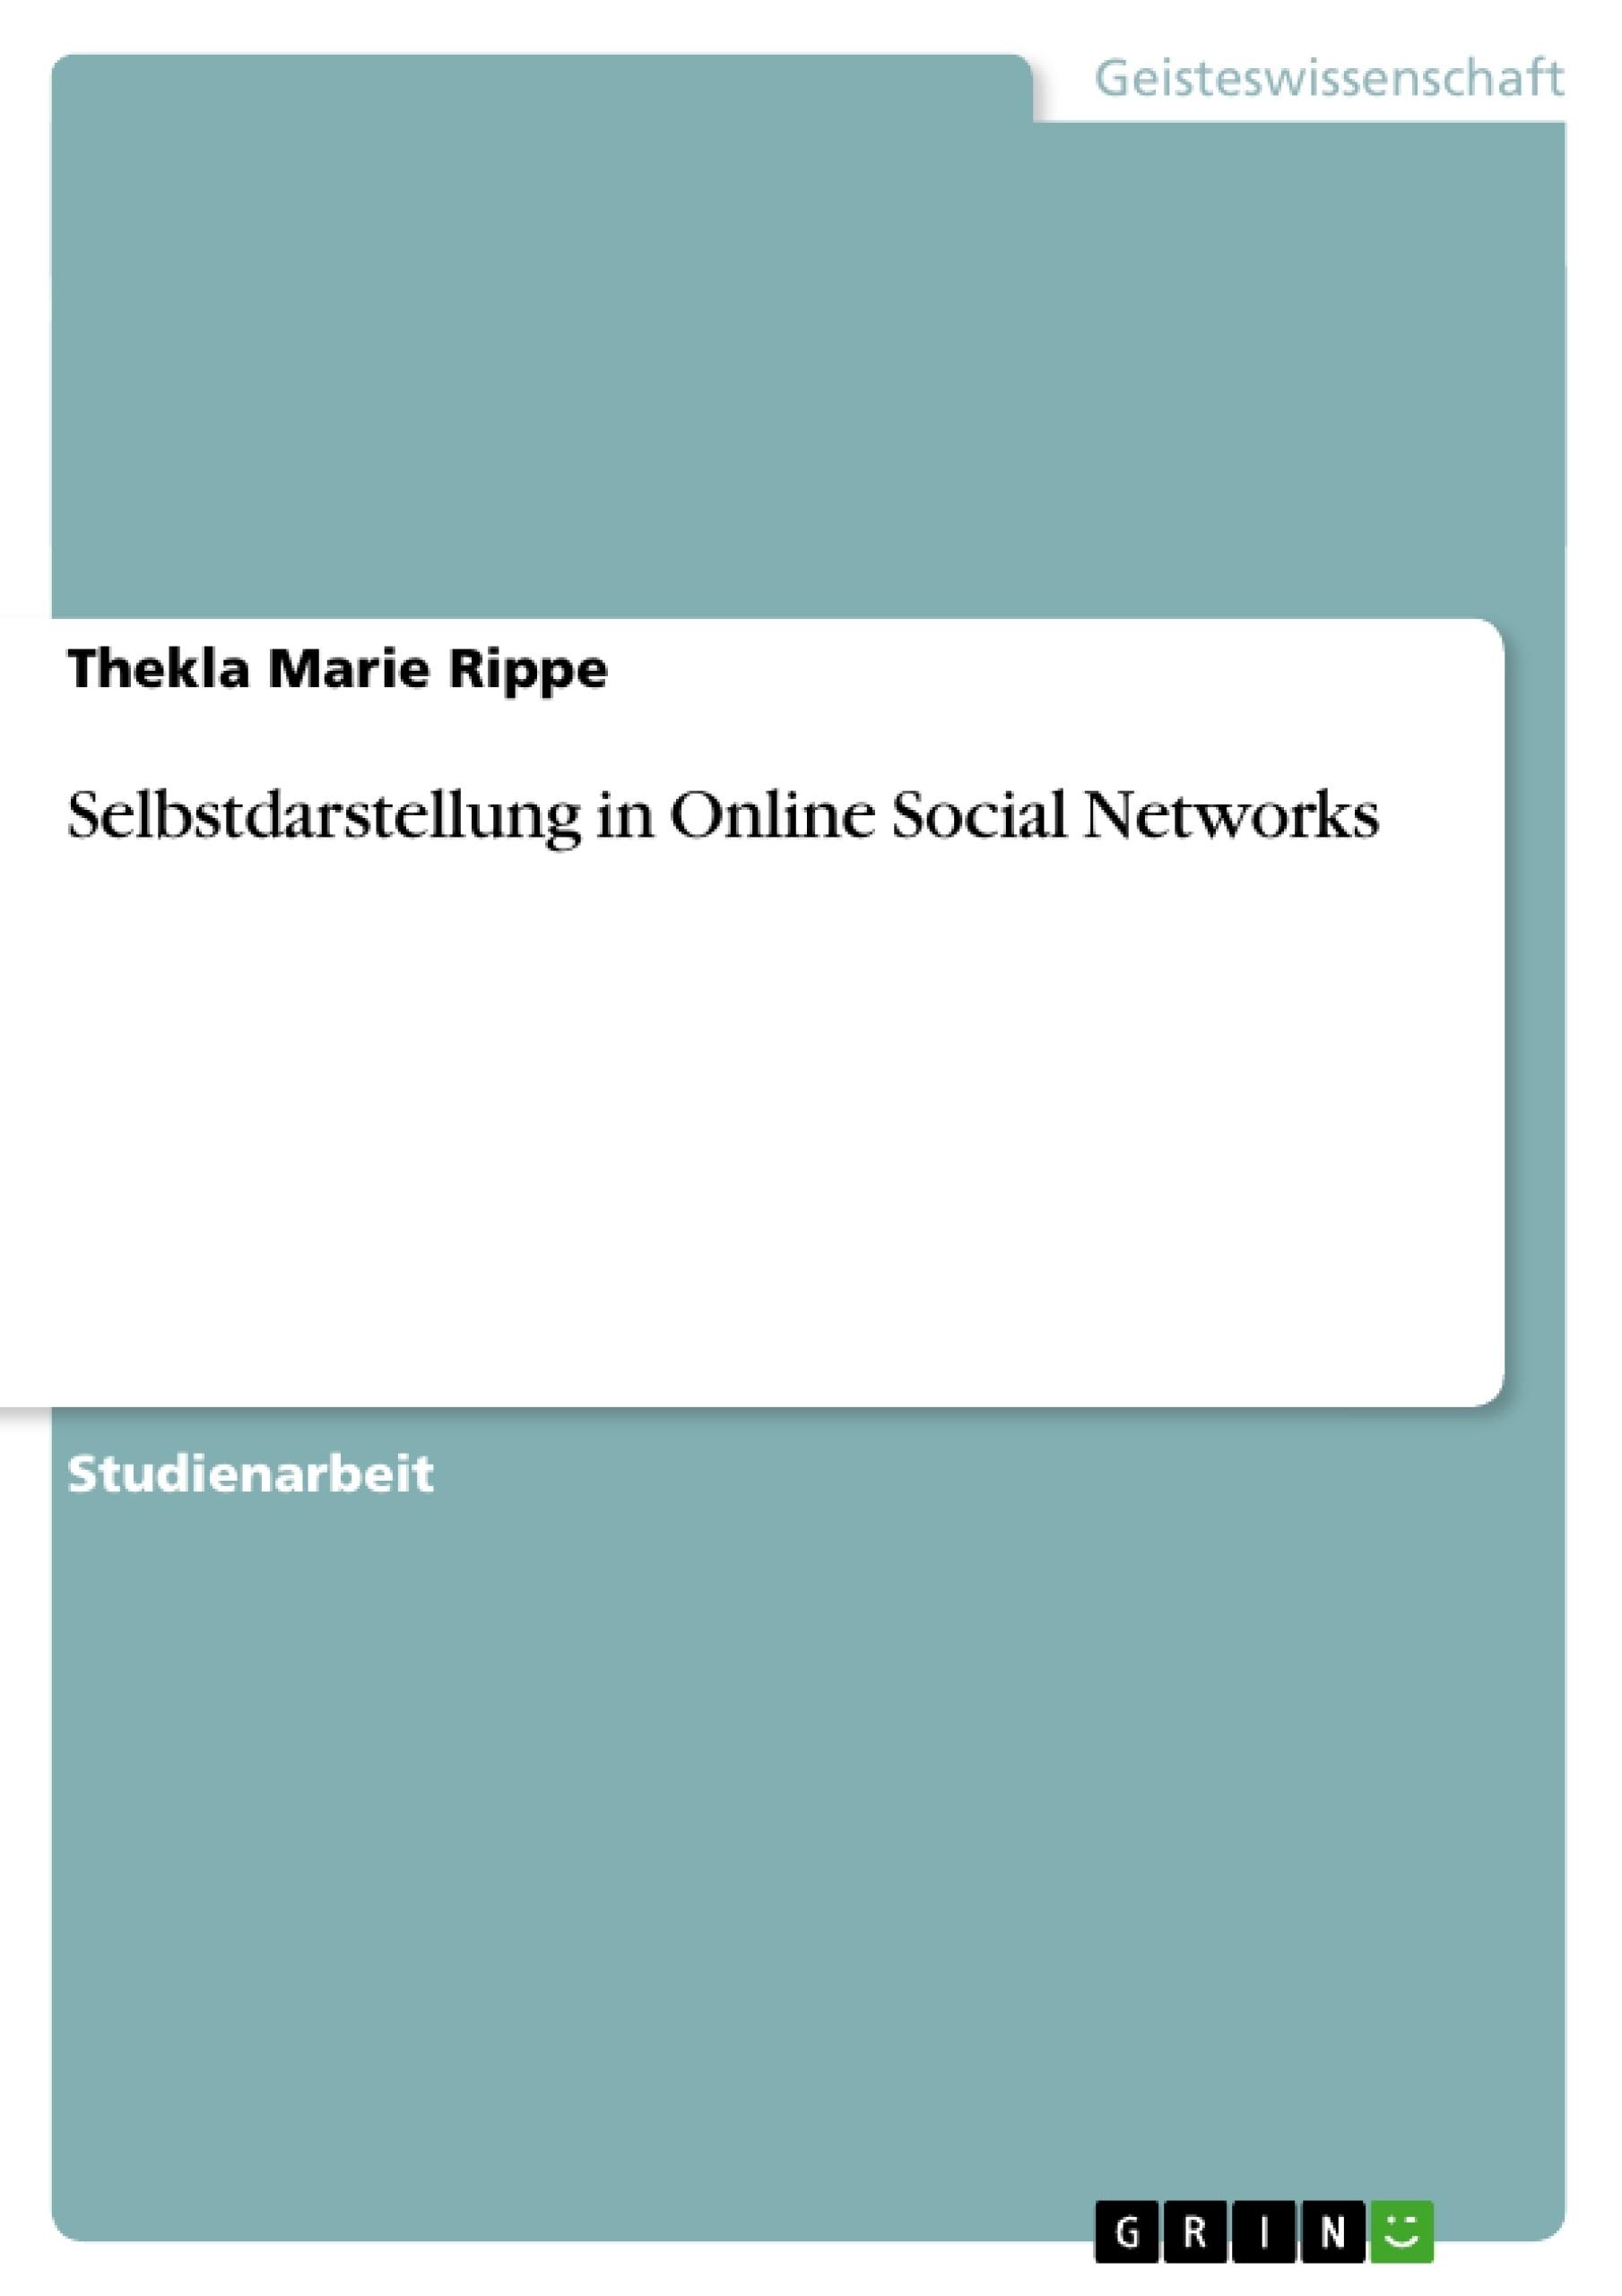 Titel: Selbstdarstellung in Online Social Networks